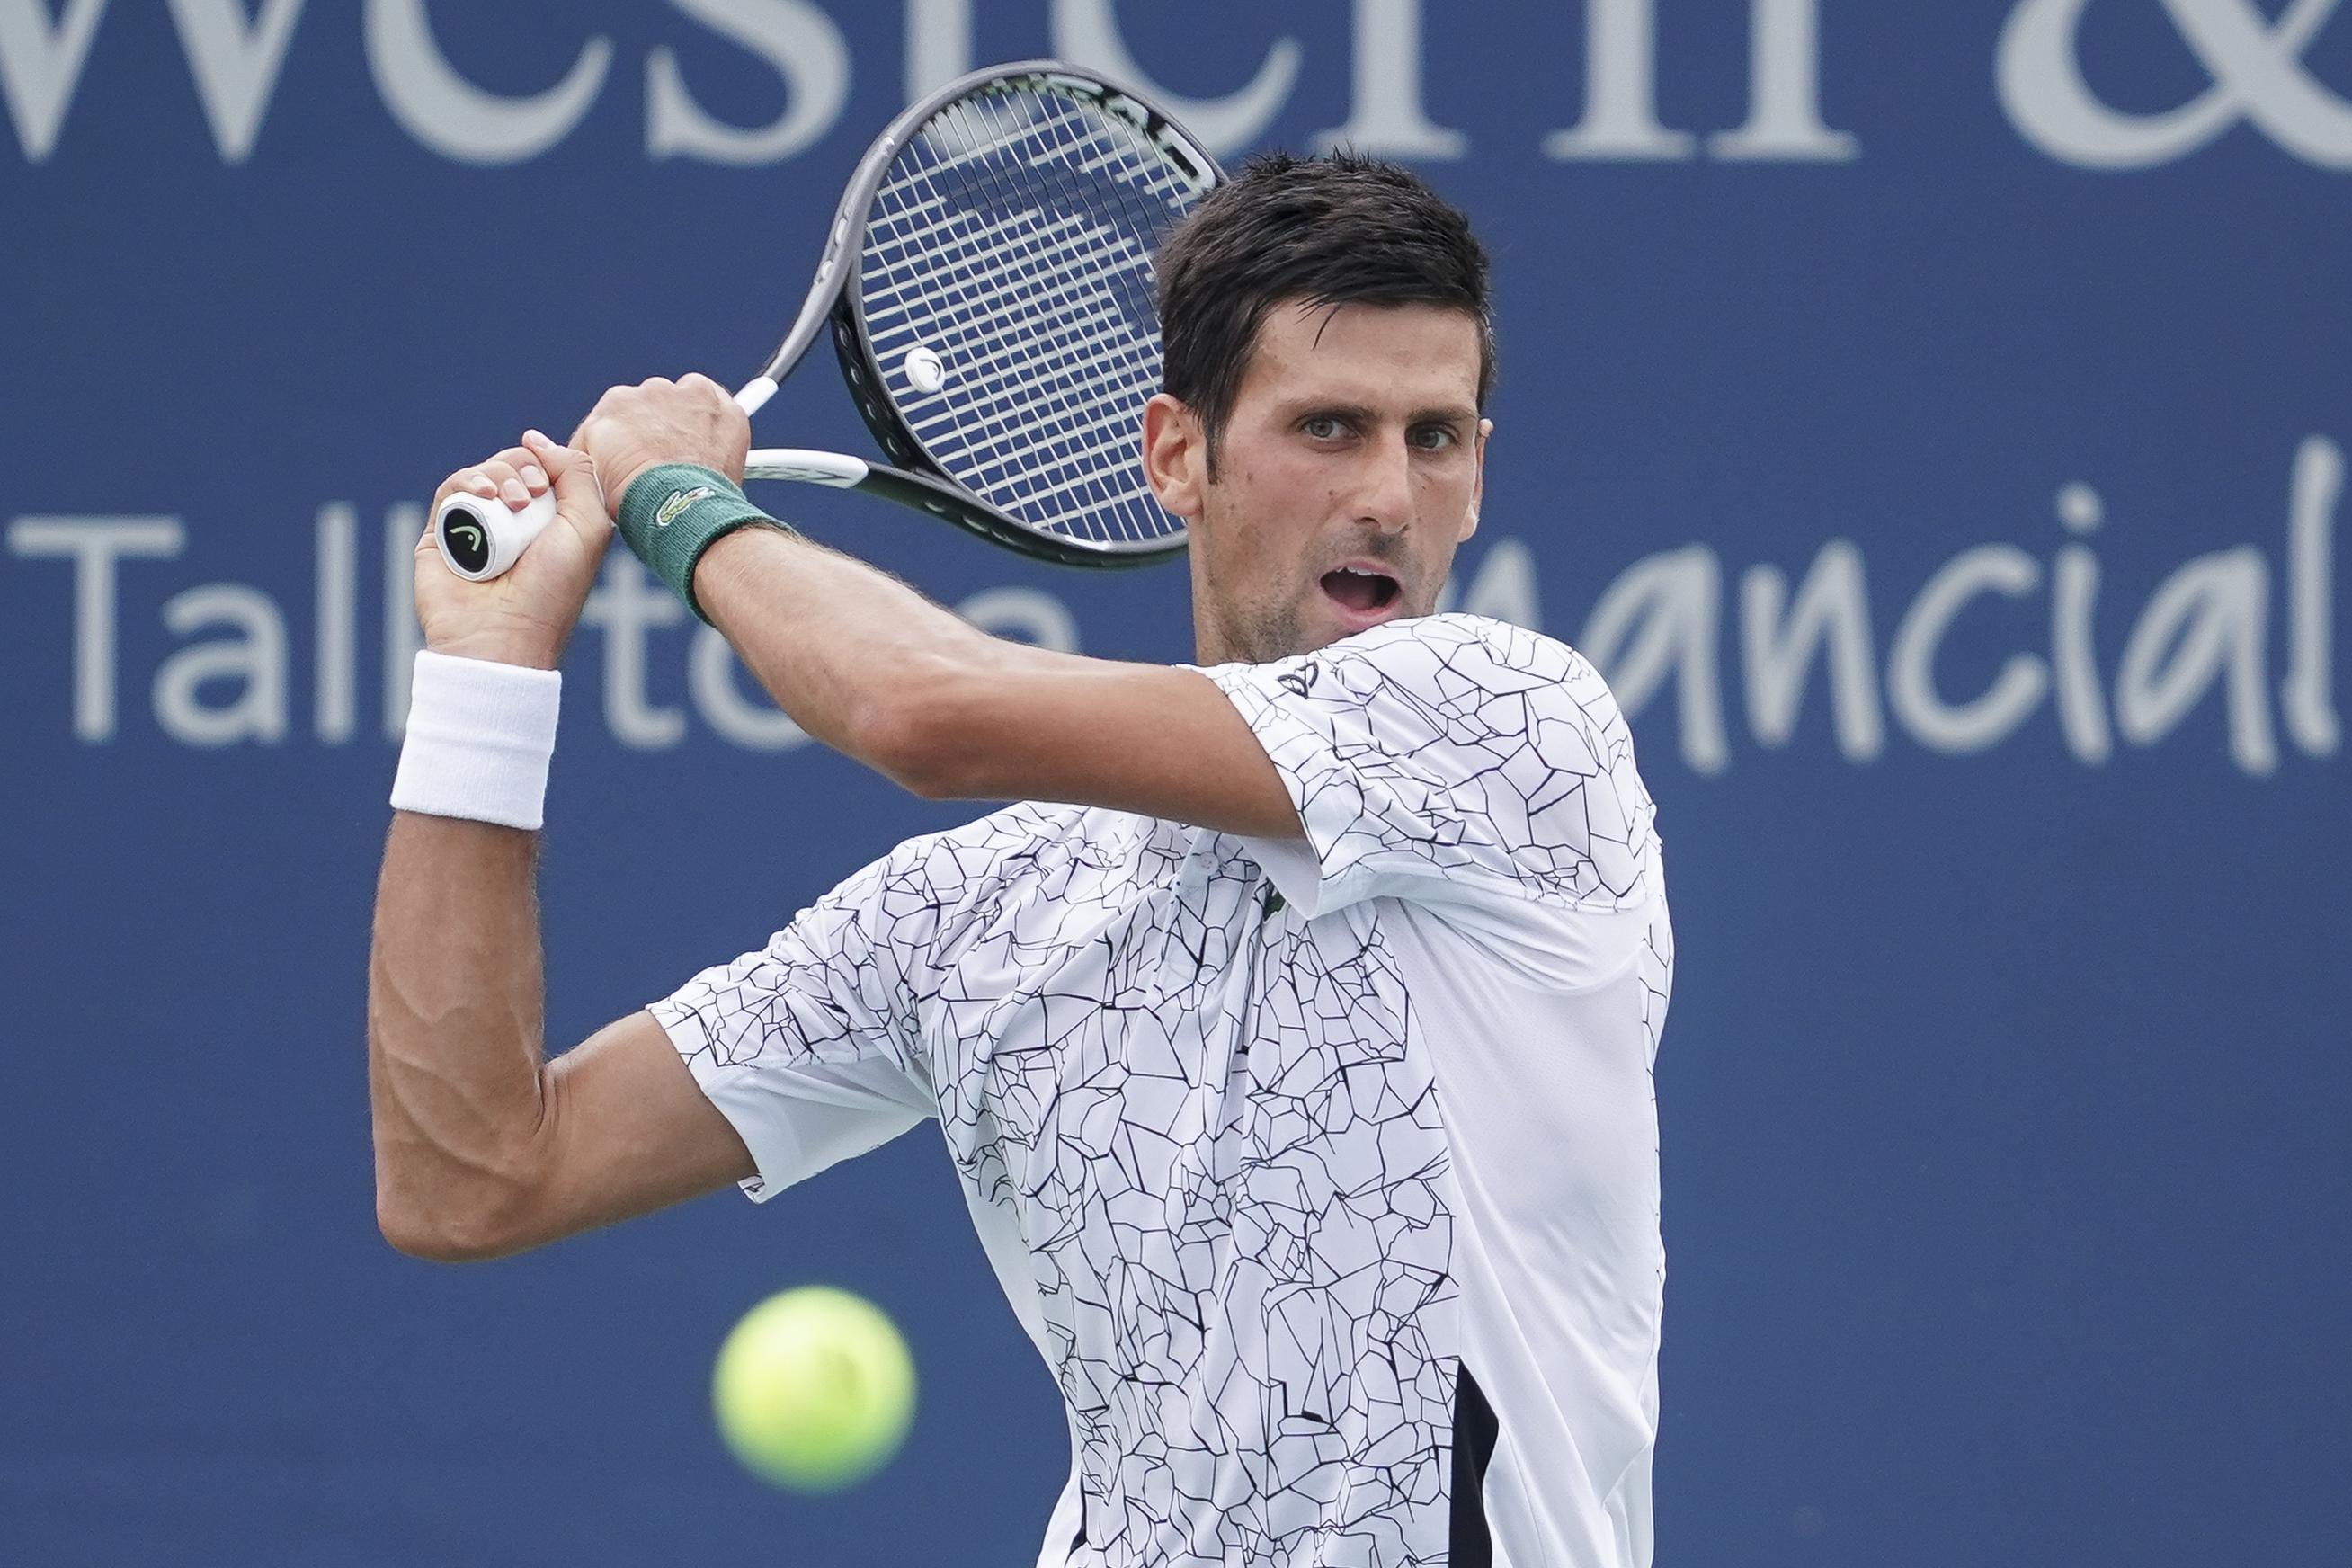 Djokovic has Never Won the Cincinnati Open